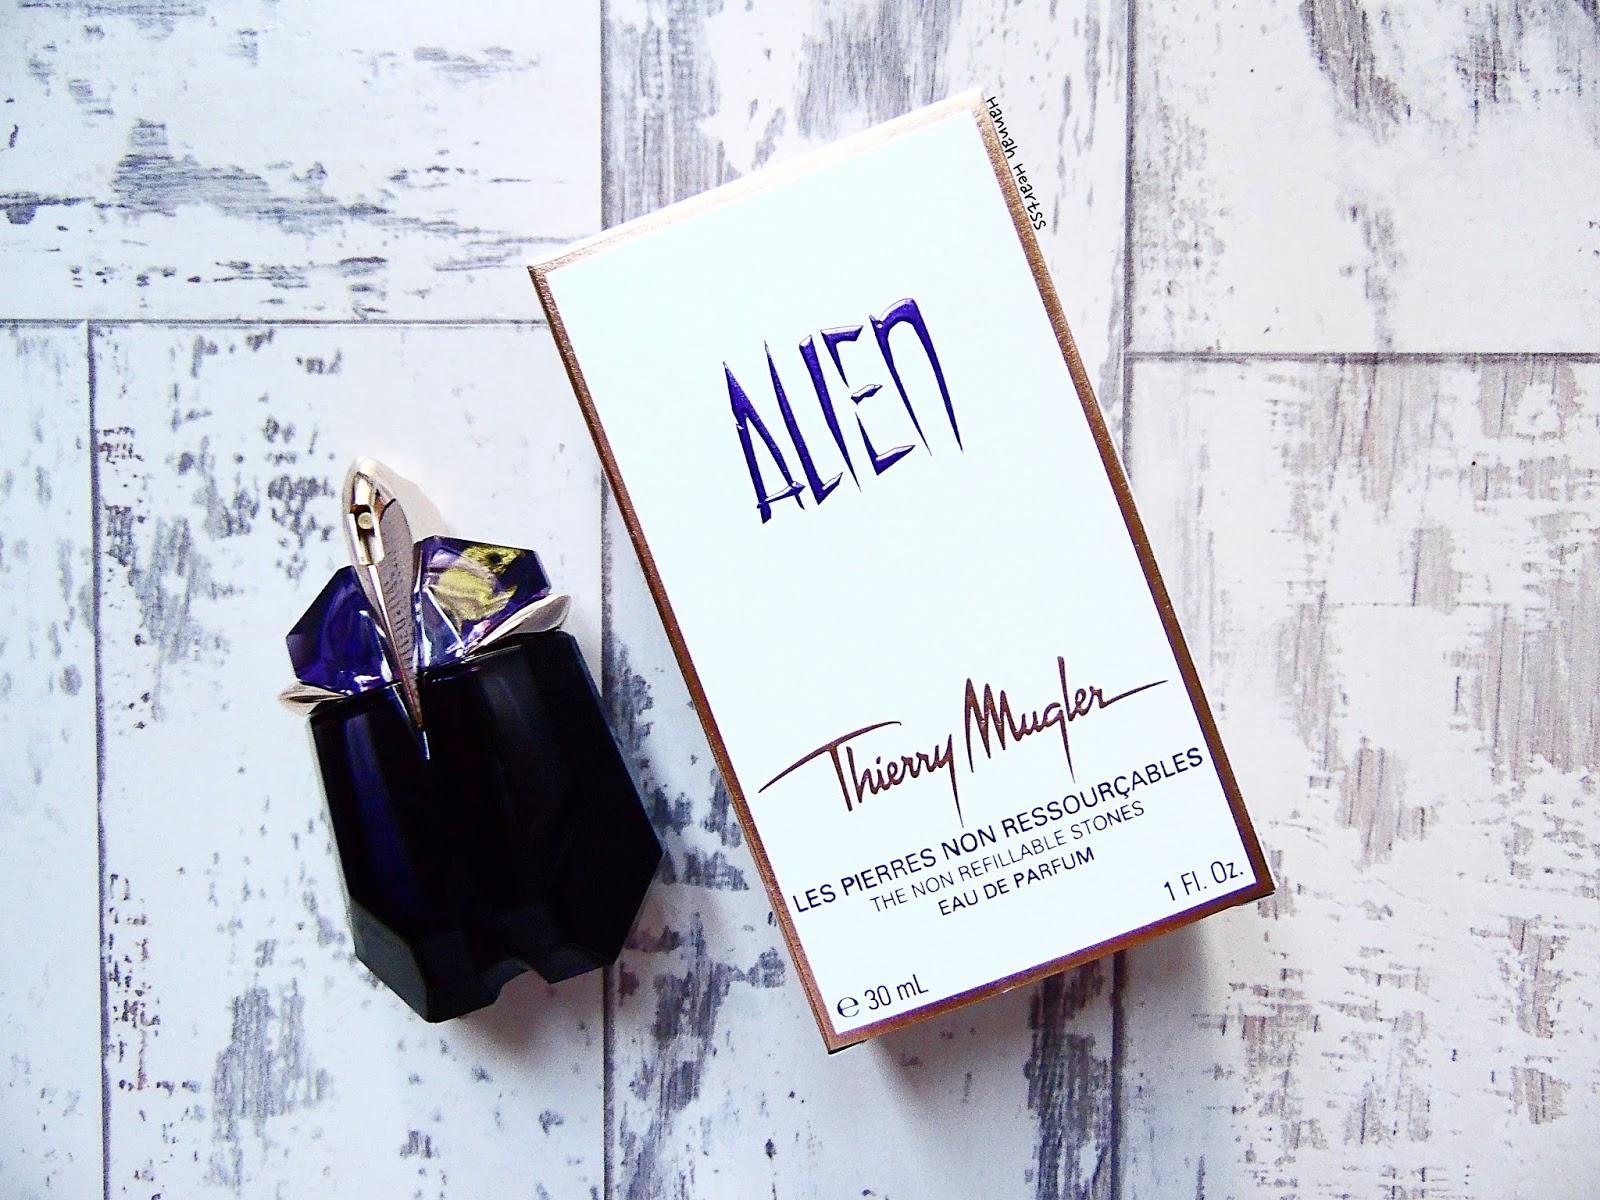 Thierry Mugler Alein Eau de Parfum